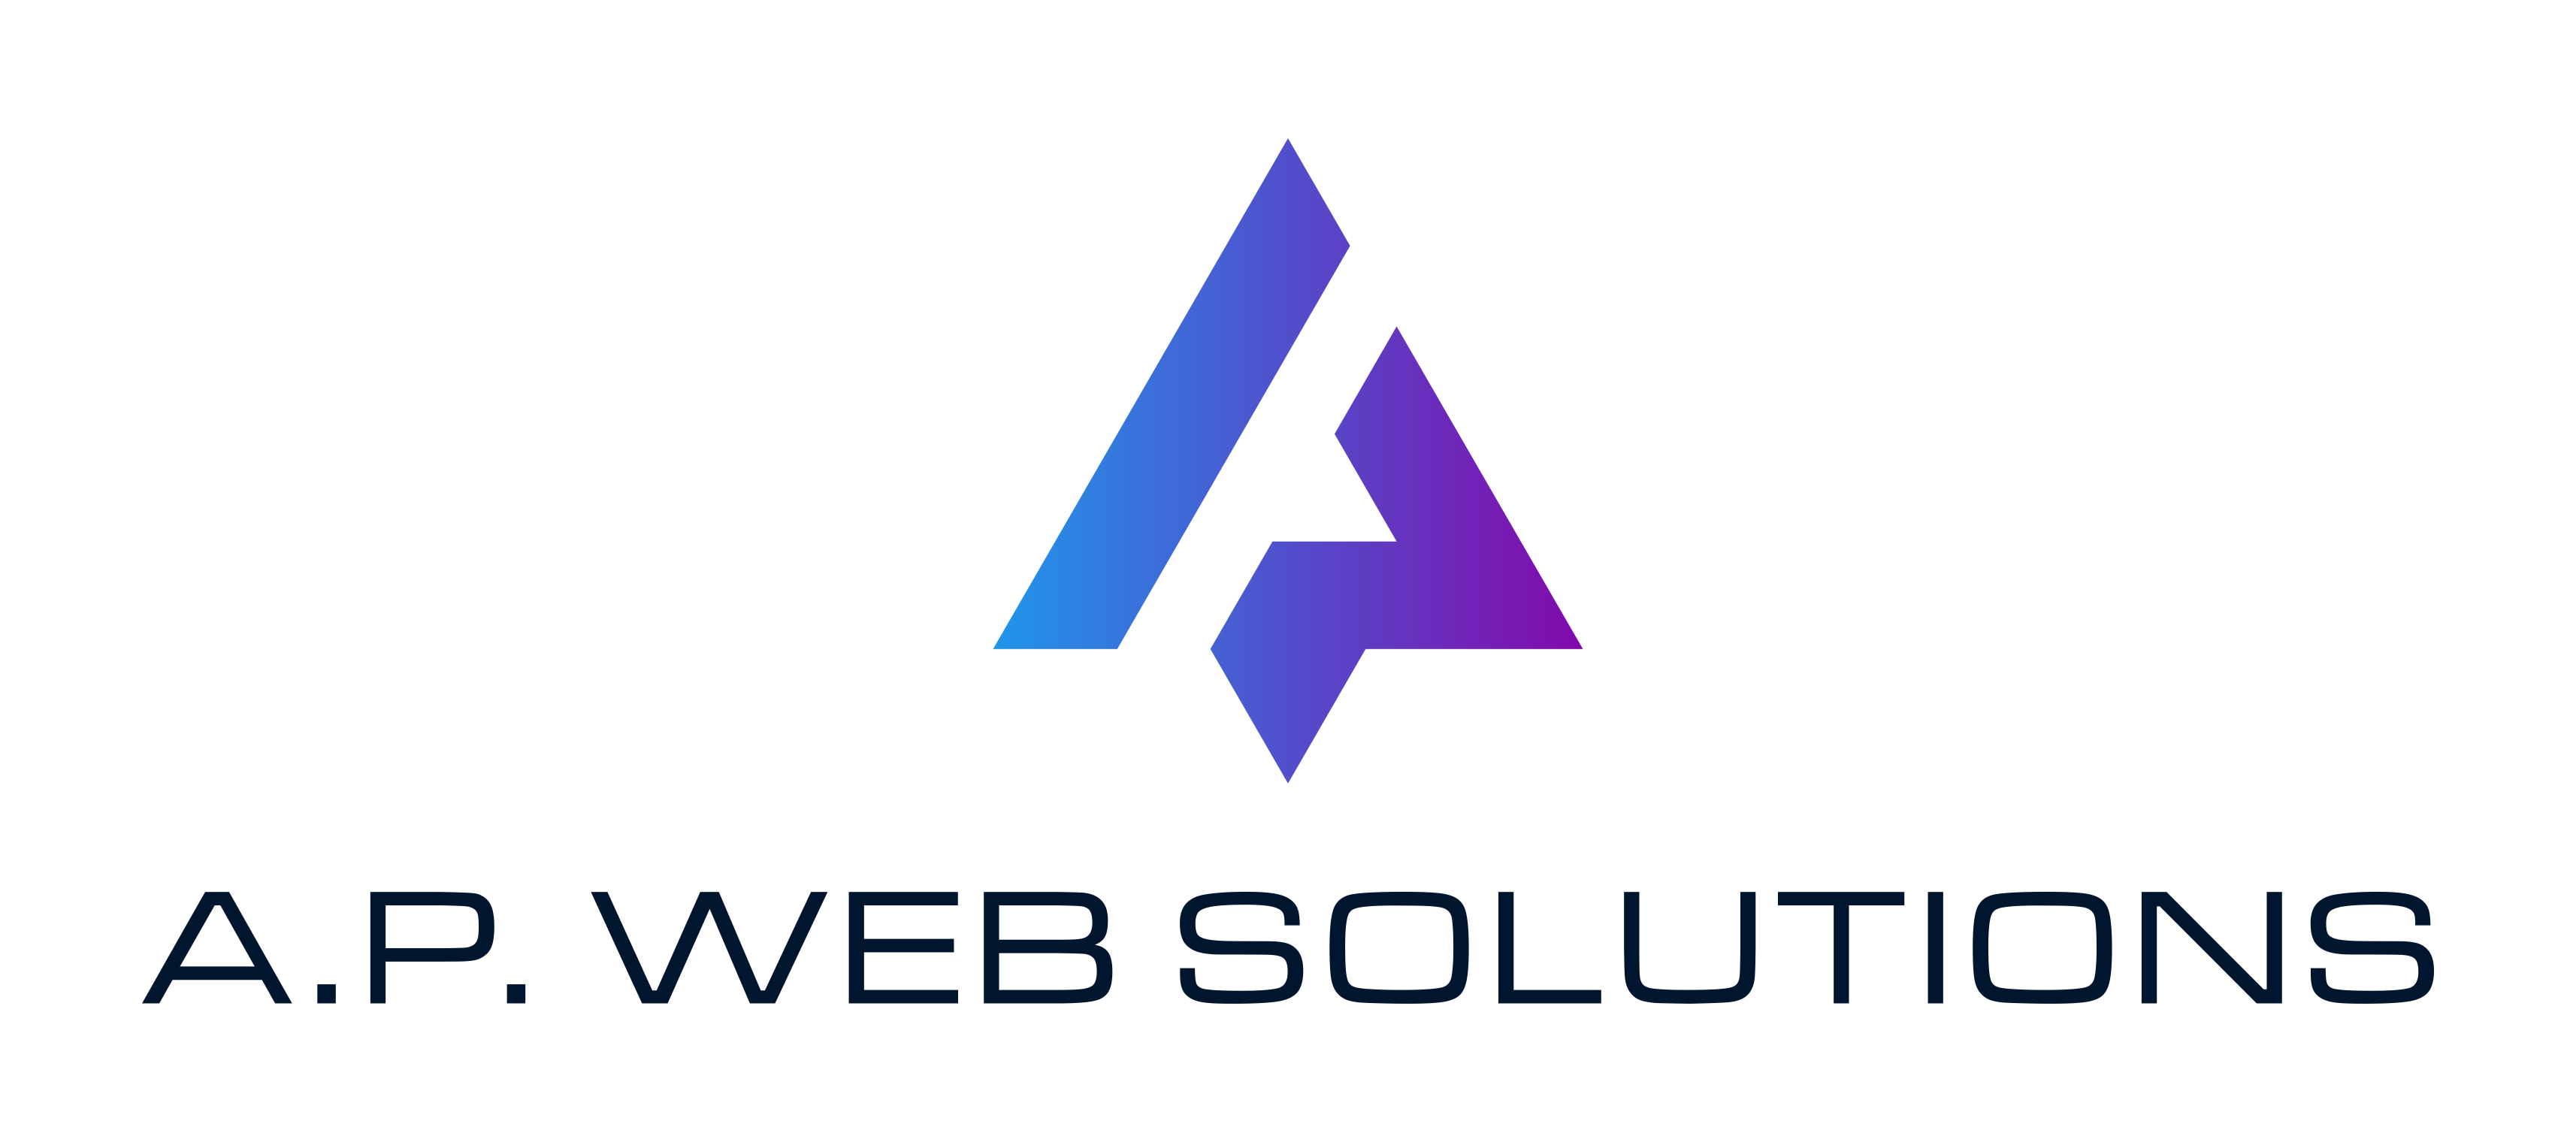 A.P Web Solutions